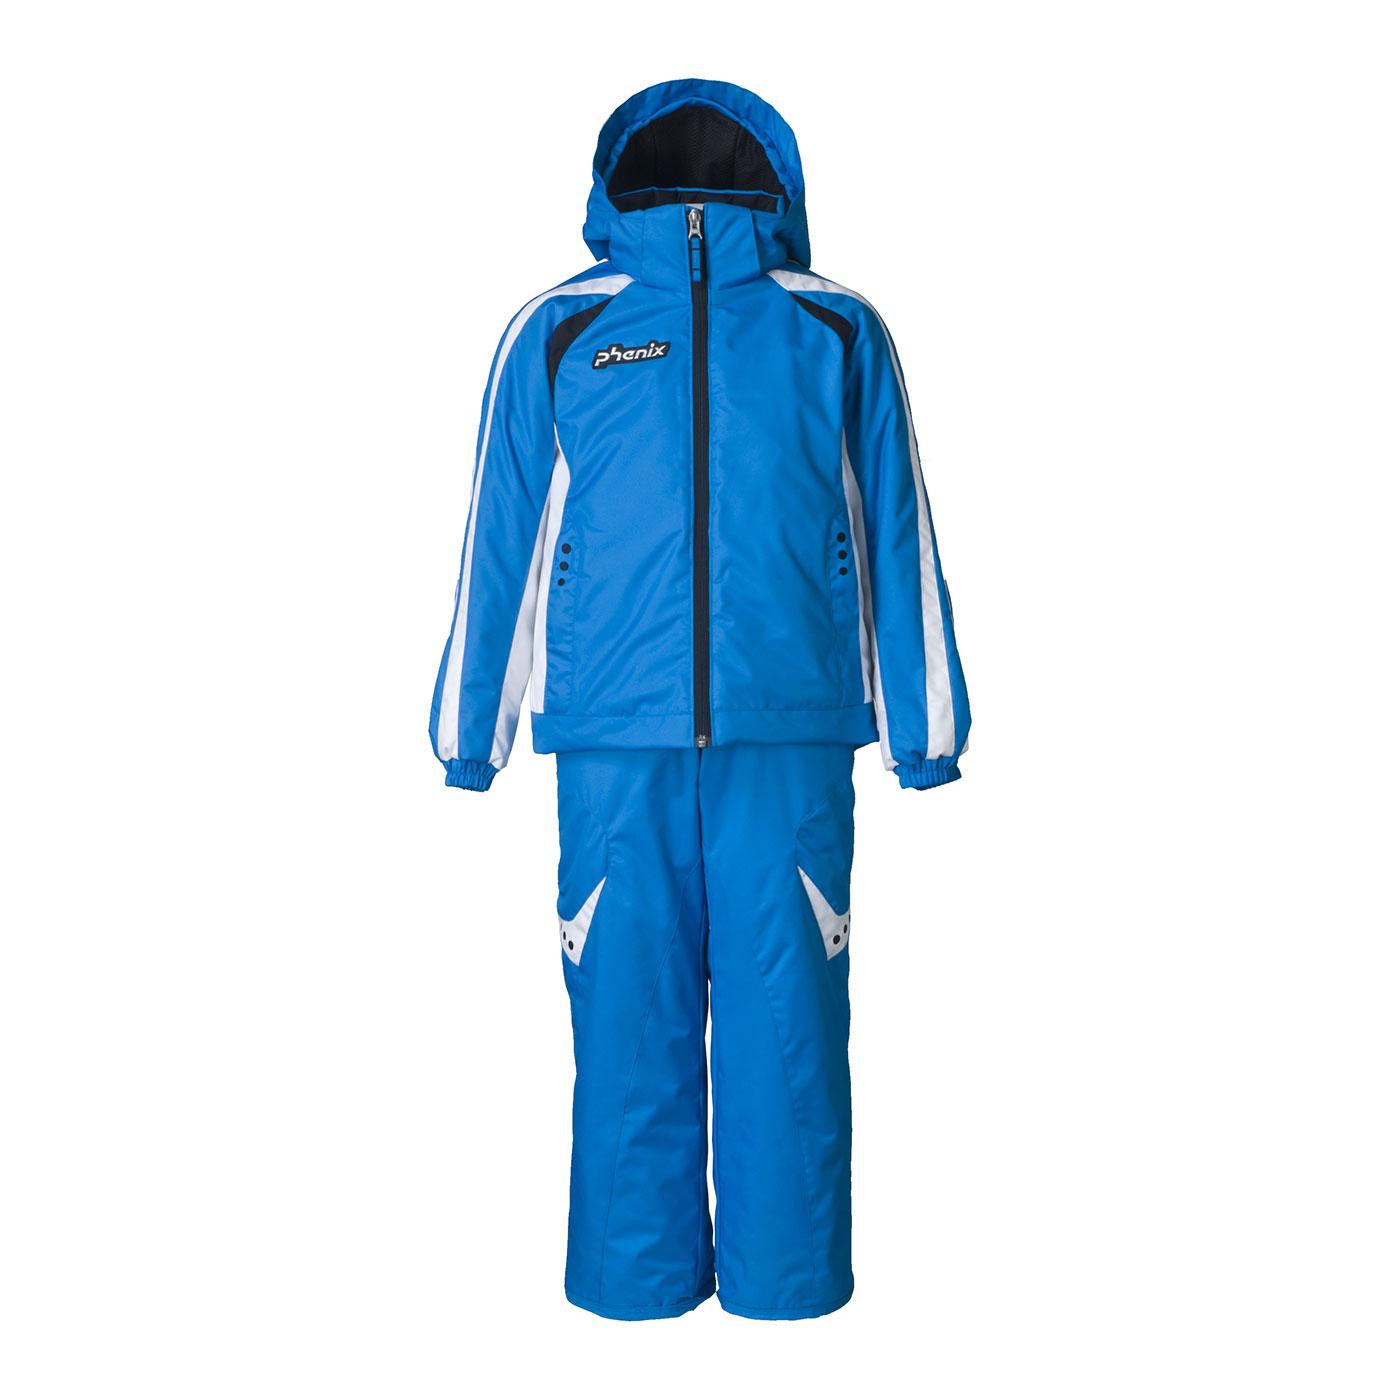 Lyžařský komplet Phenix SukuSuku Thunderbird Barva: modrá bunda/modré kalhoty, Velikost: 2-6